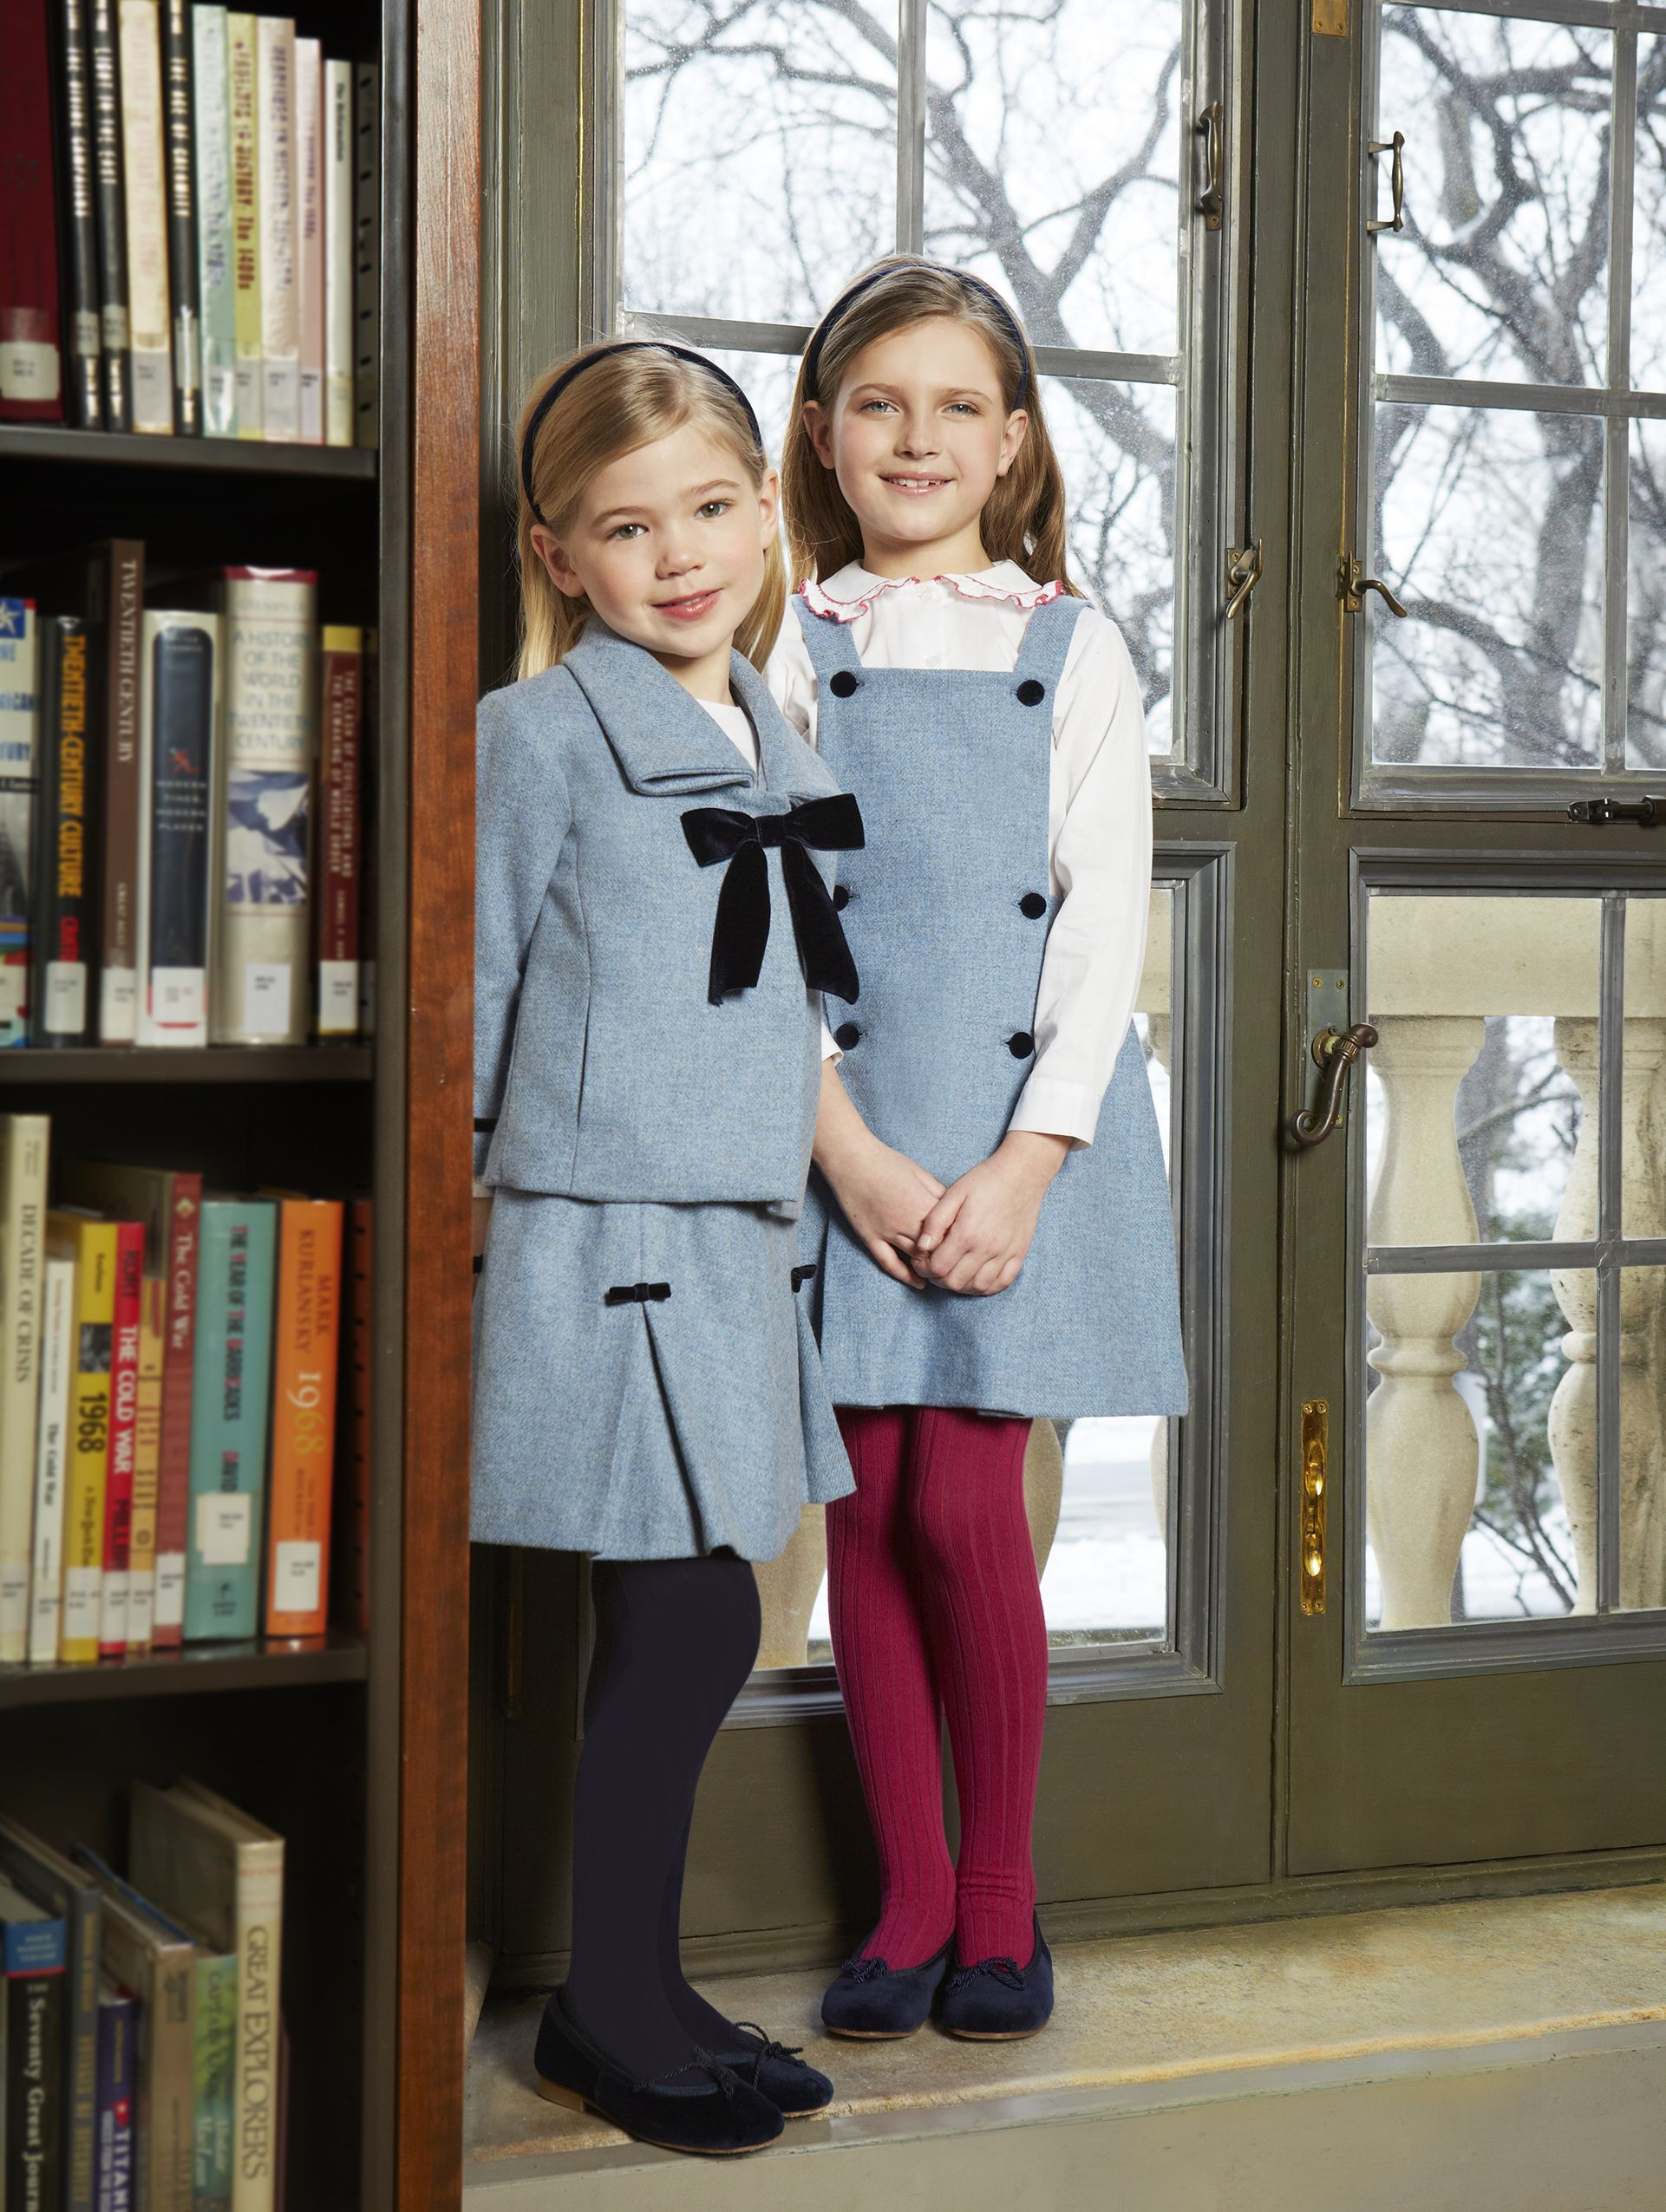 childrenswear fall 2015 childrenswear pinterest. Black Bedroom Furniture Sets. Home Design Ideas